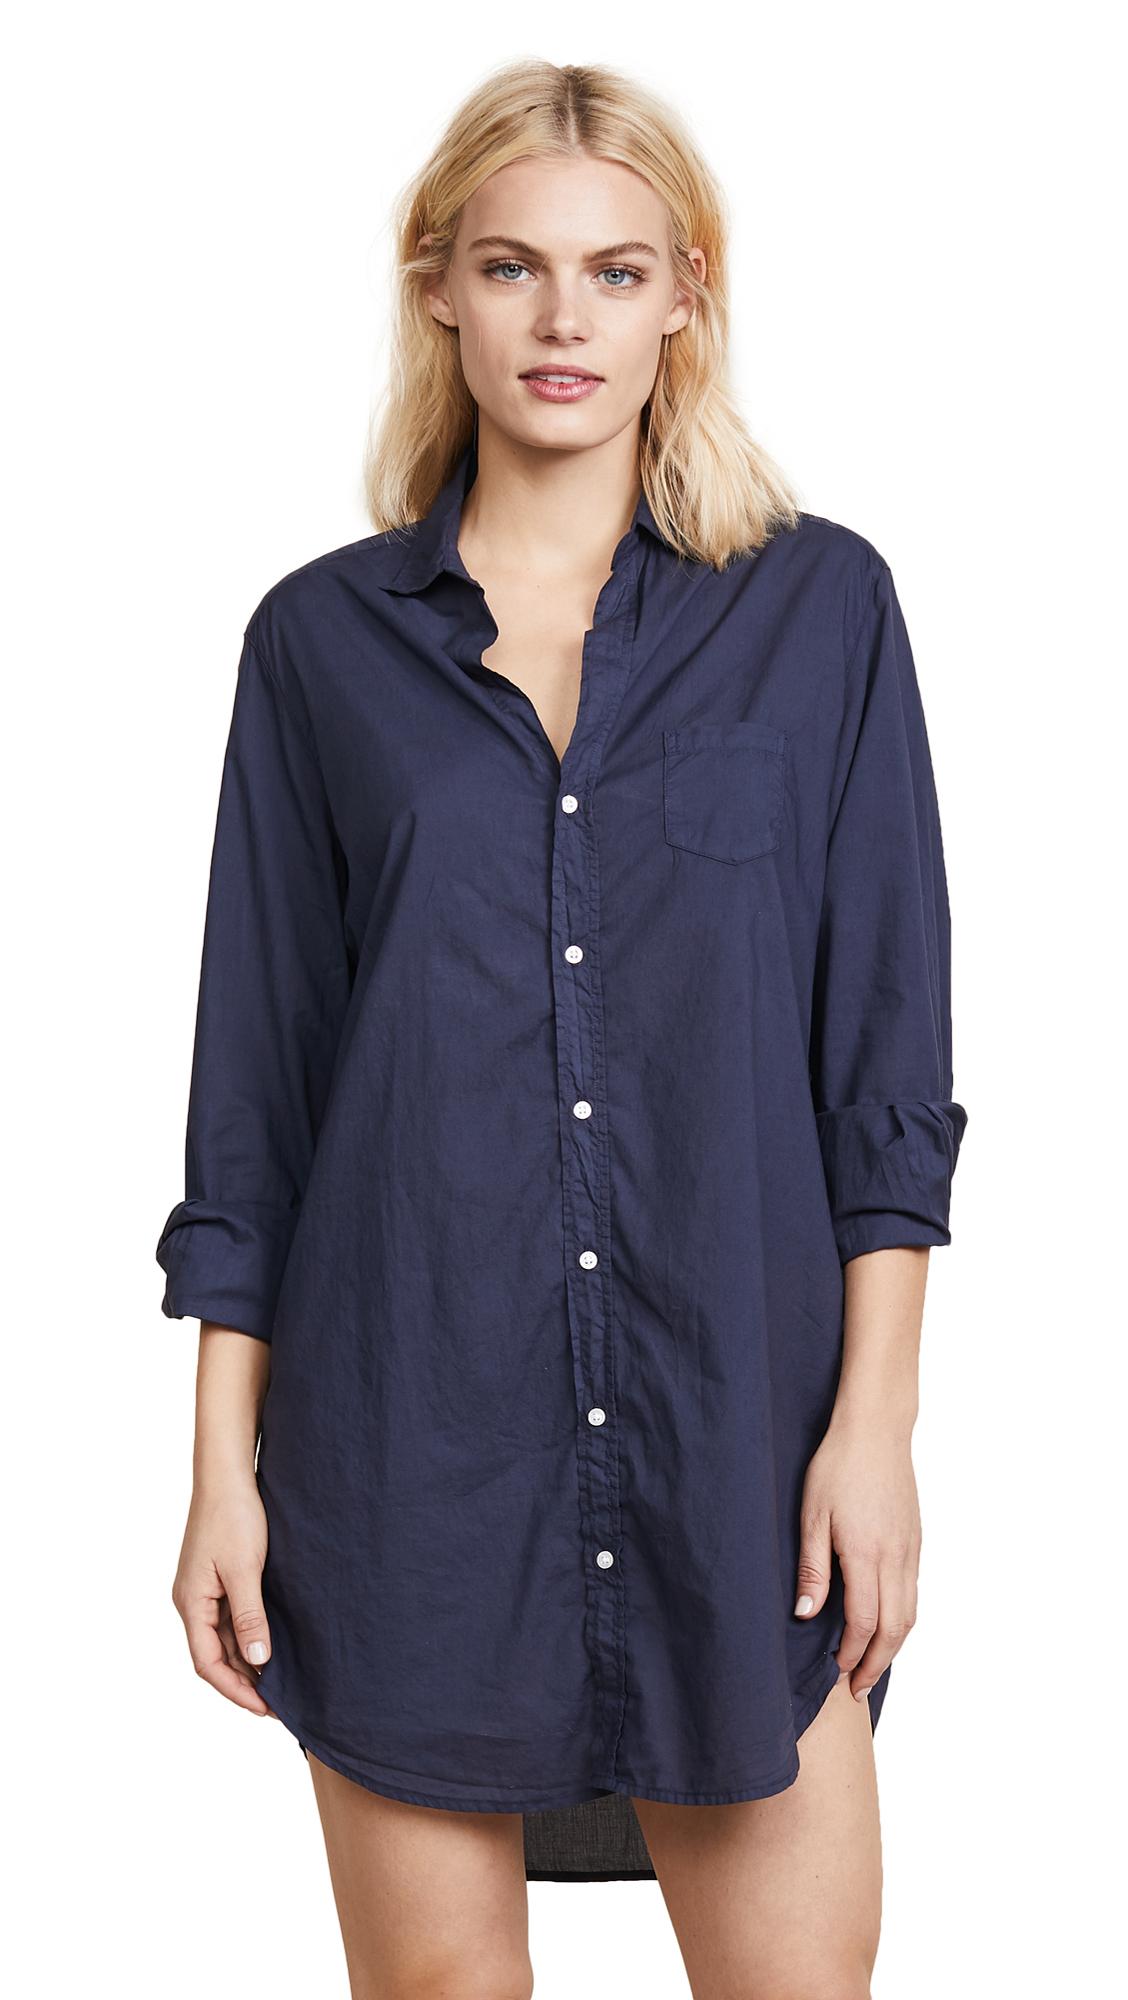 Frank Eileen Mary Shirtdress Navy Modesens